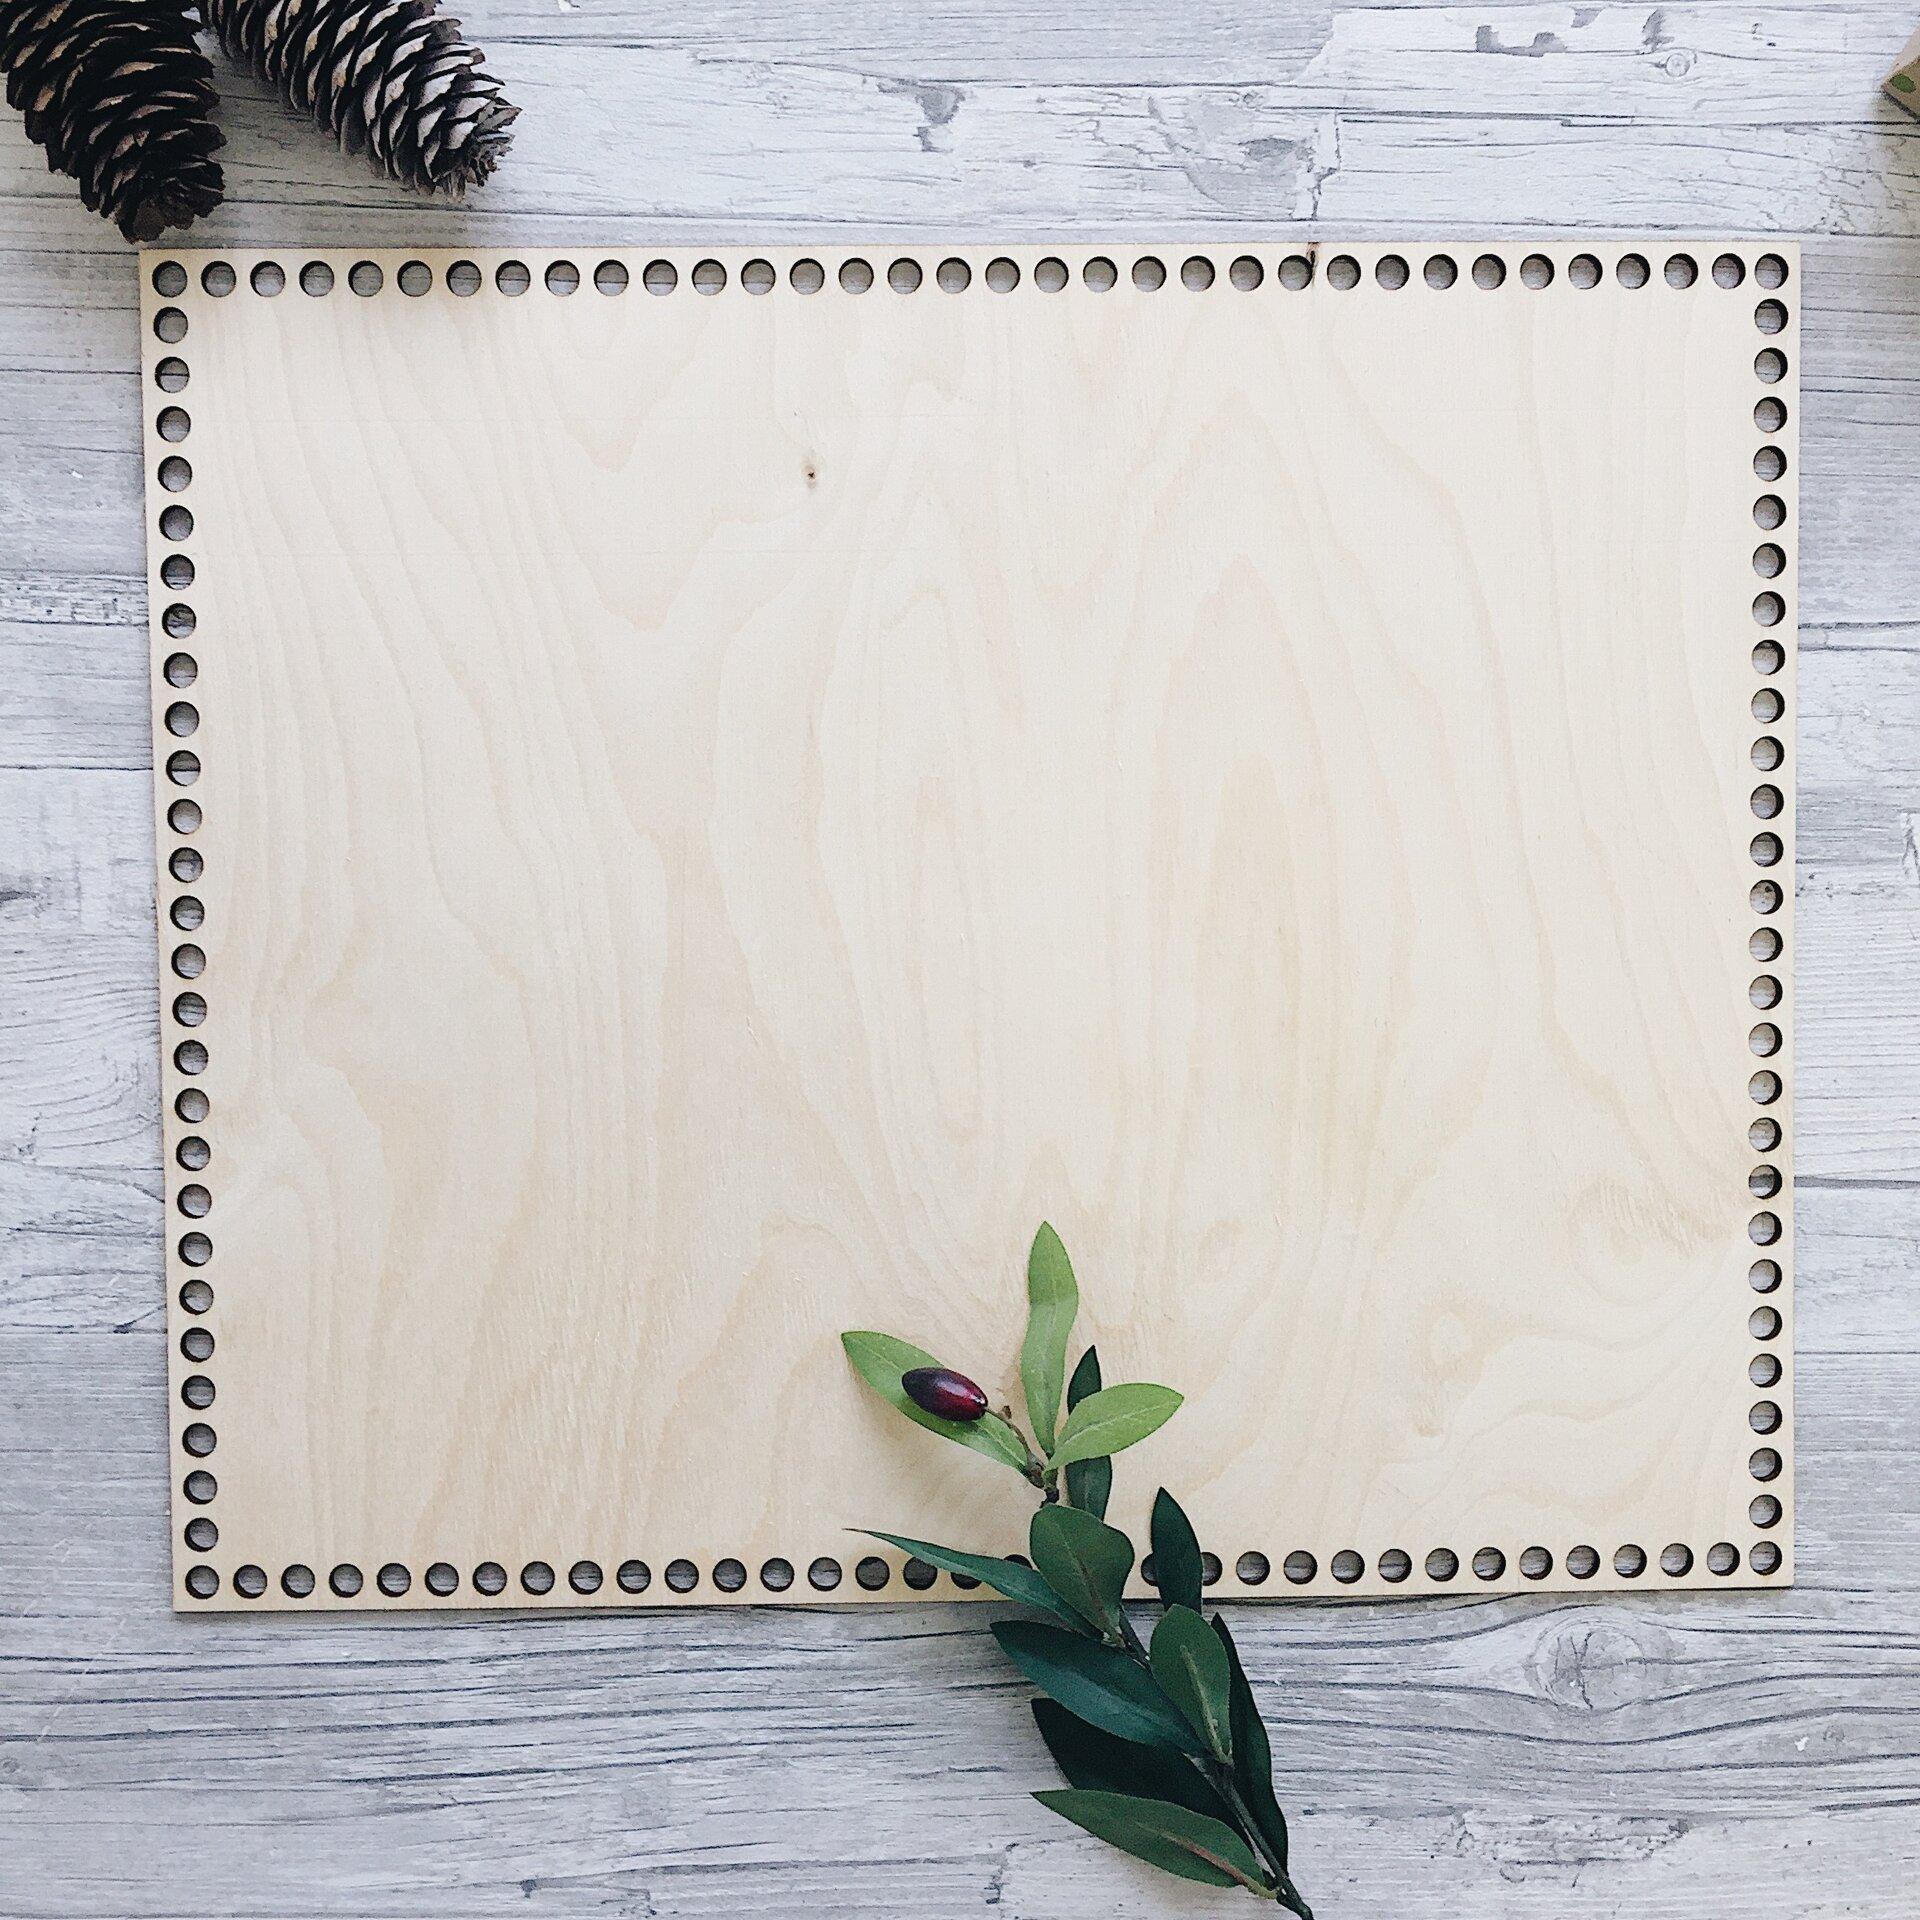 Деревянное донышко для корзины, прямоугольник с острыми углами 33х32см - фото pic_08bbb40091b870ab92378585d52287f7_1920x9000_1.jpg